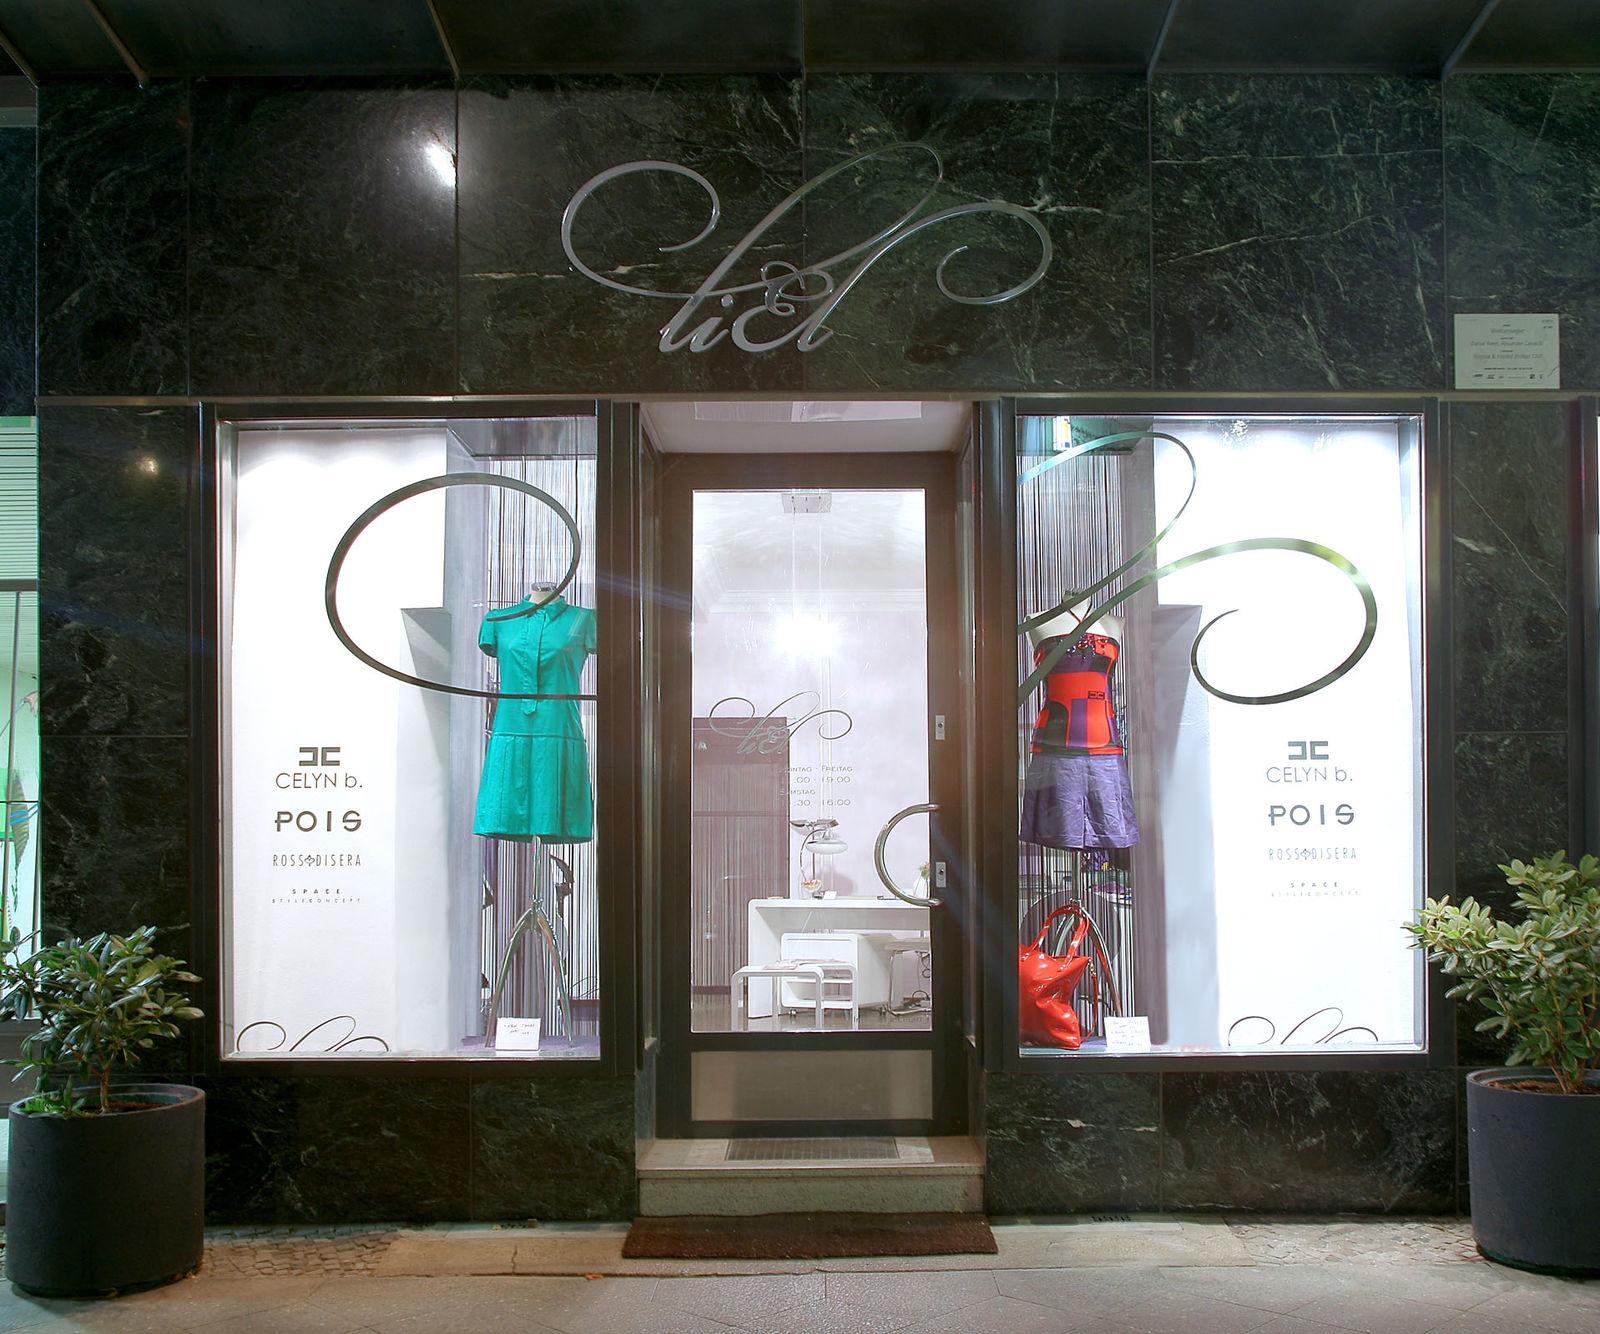 LiEl Boutique in Berlin (Bild 2)